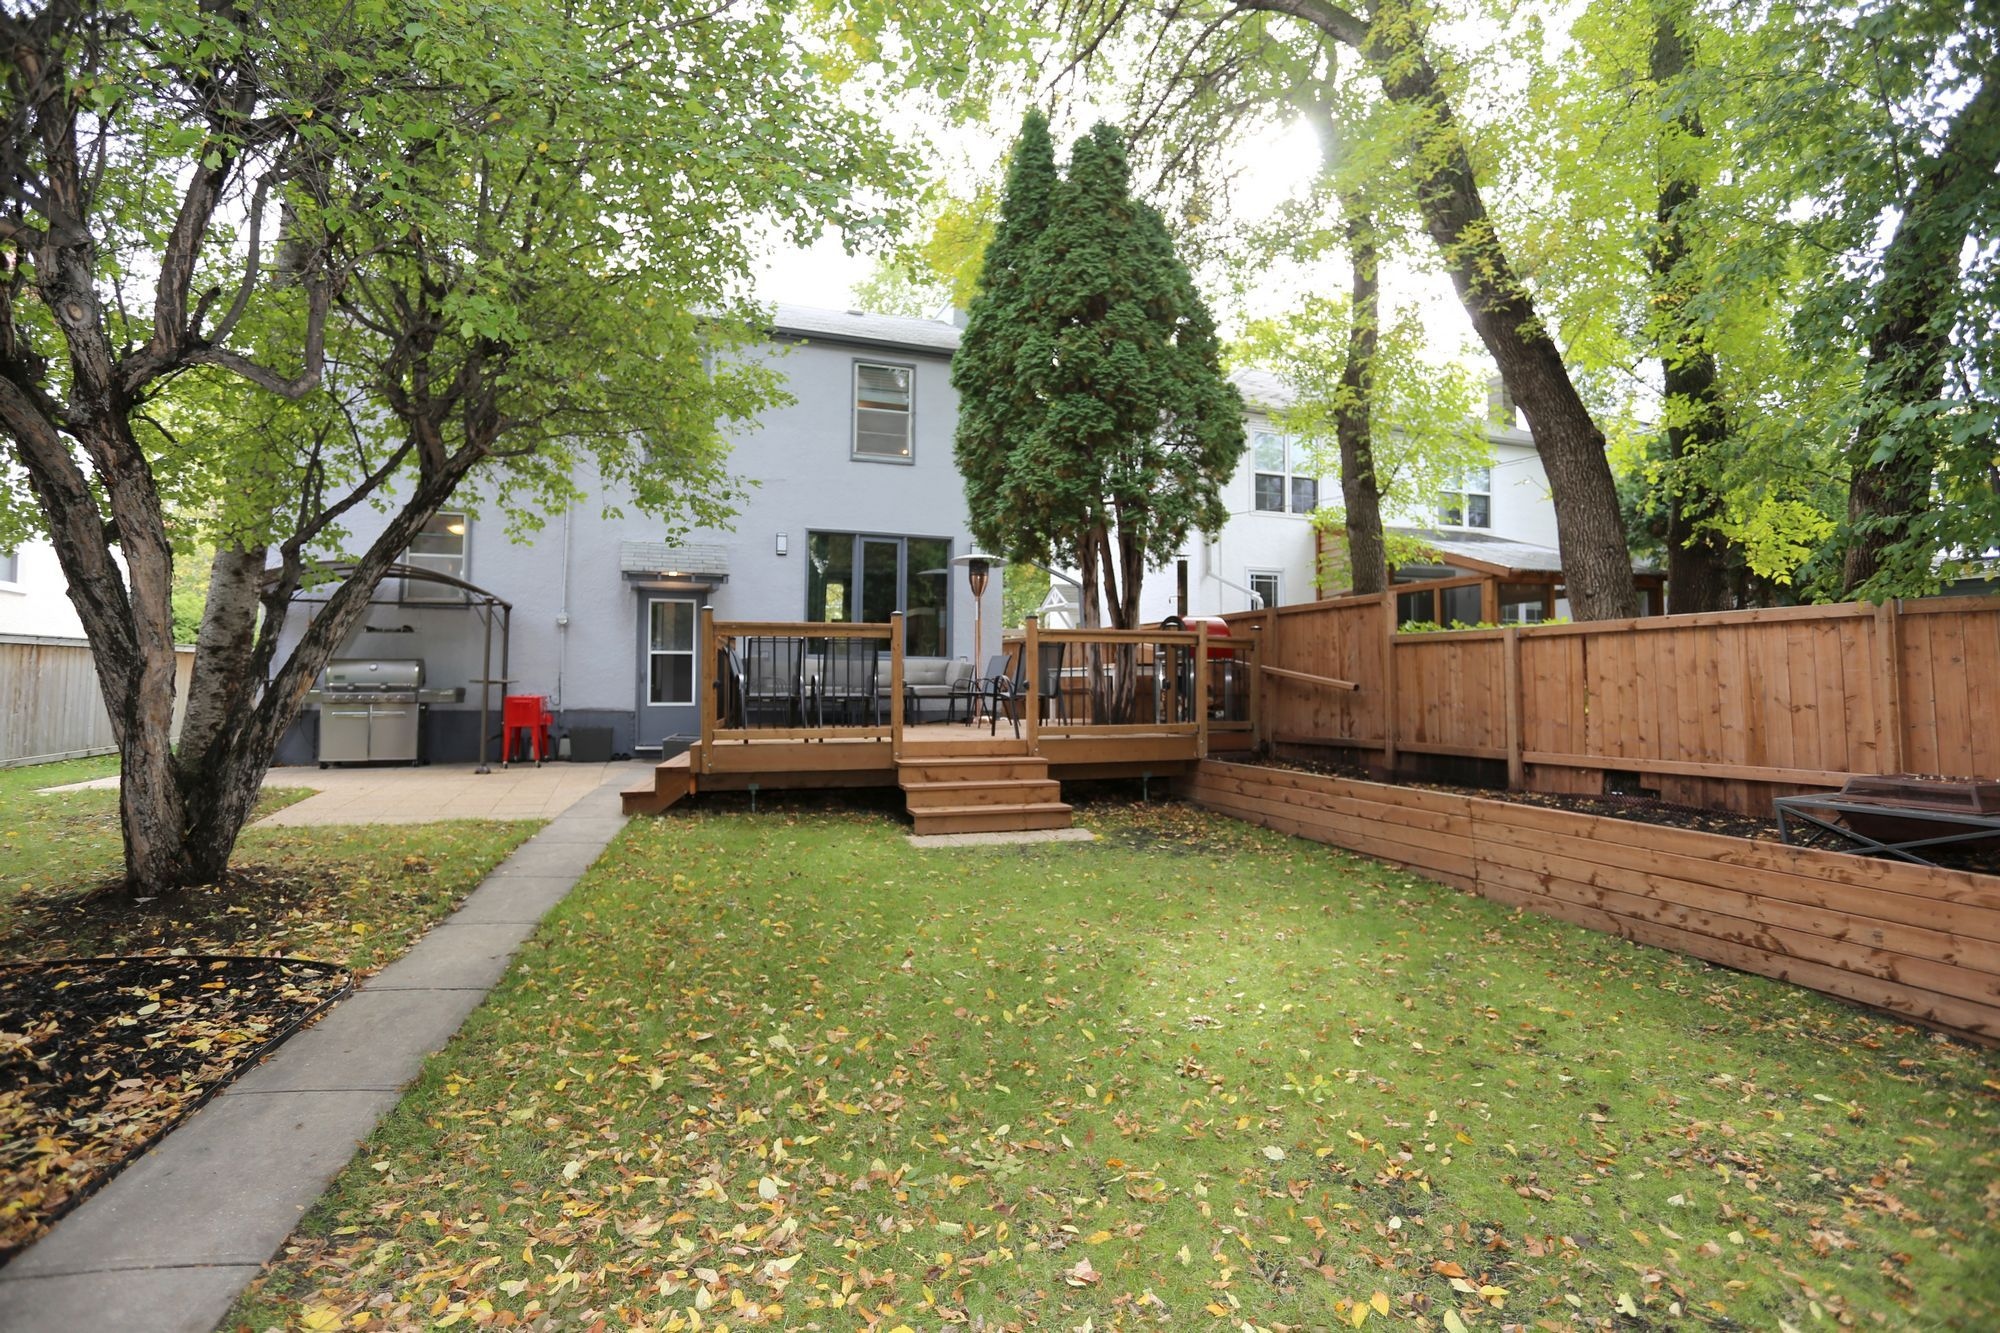 543 Ash St, Winnipeg, Manitoba  R3N 0R3 - Photo 29 - 1725537